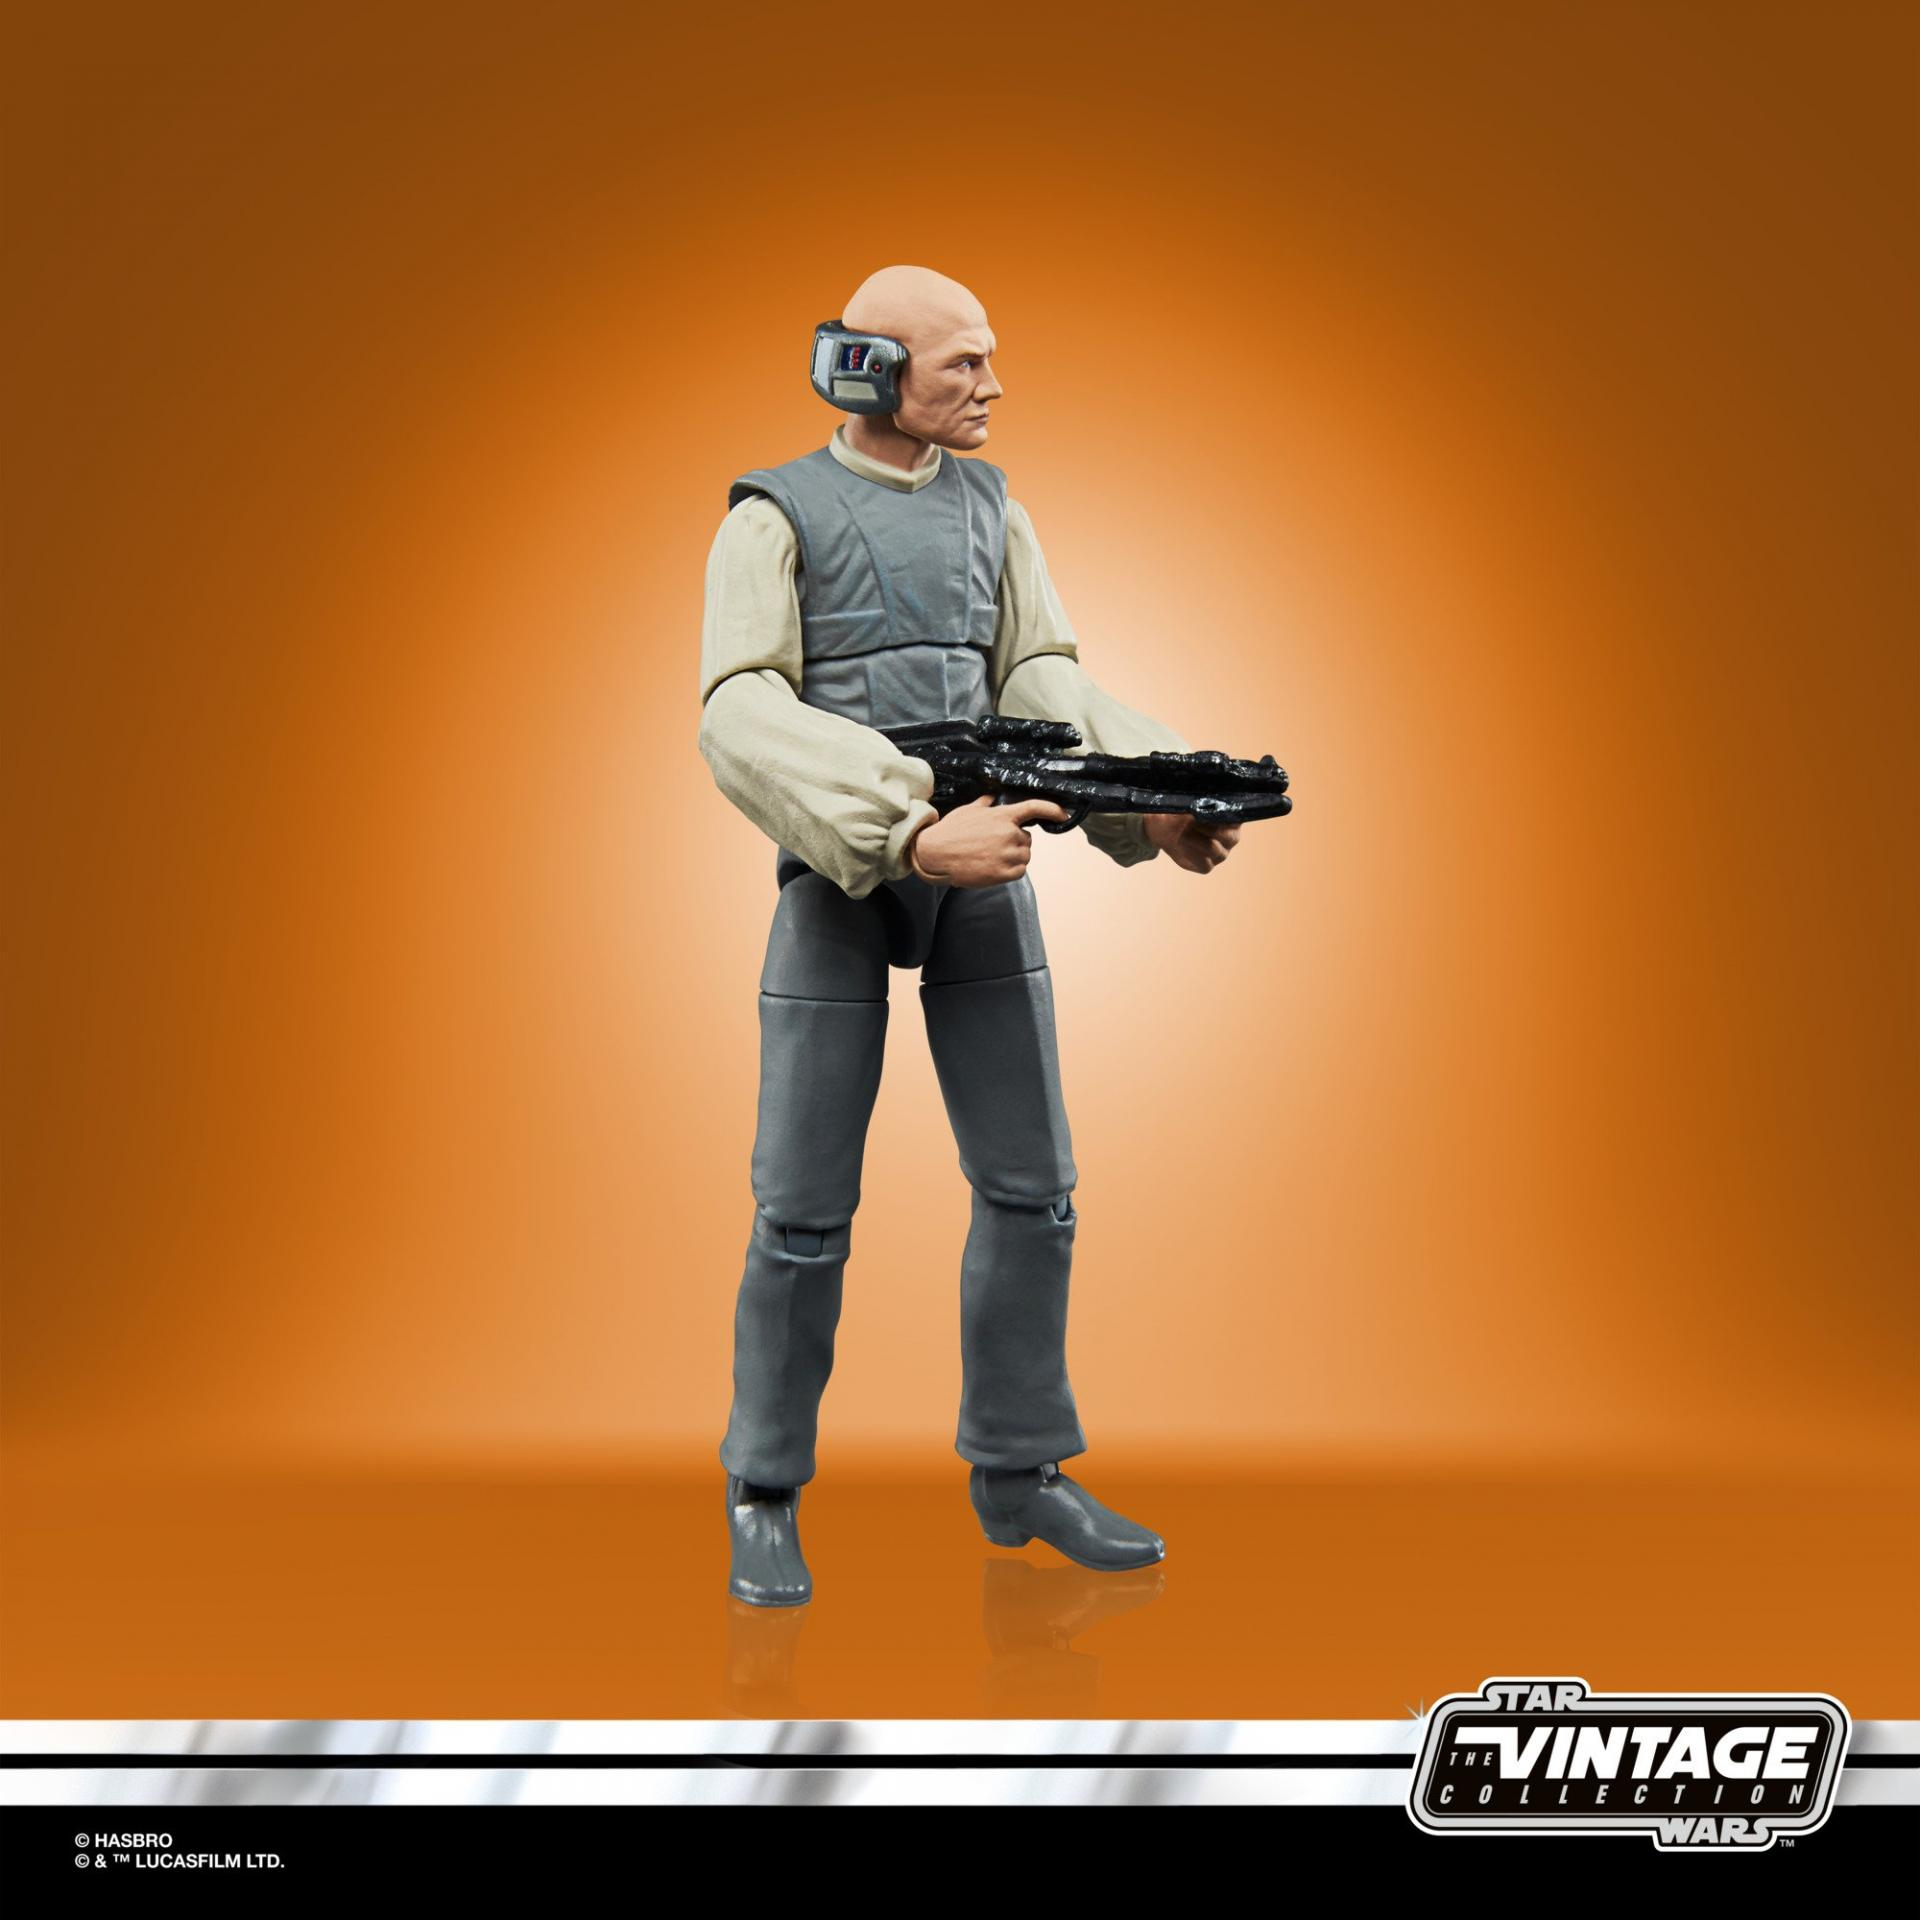 Star wars the vintage collection lobot4